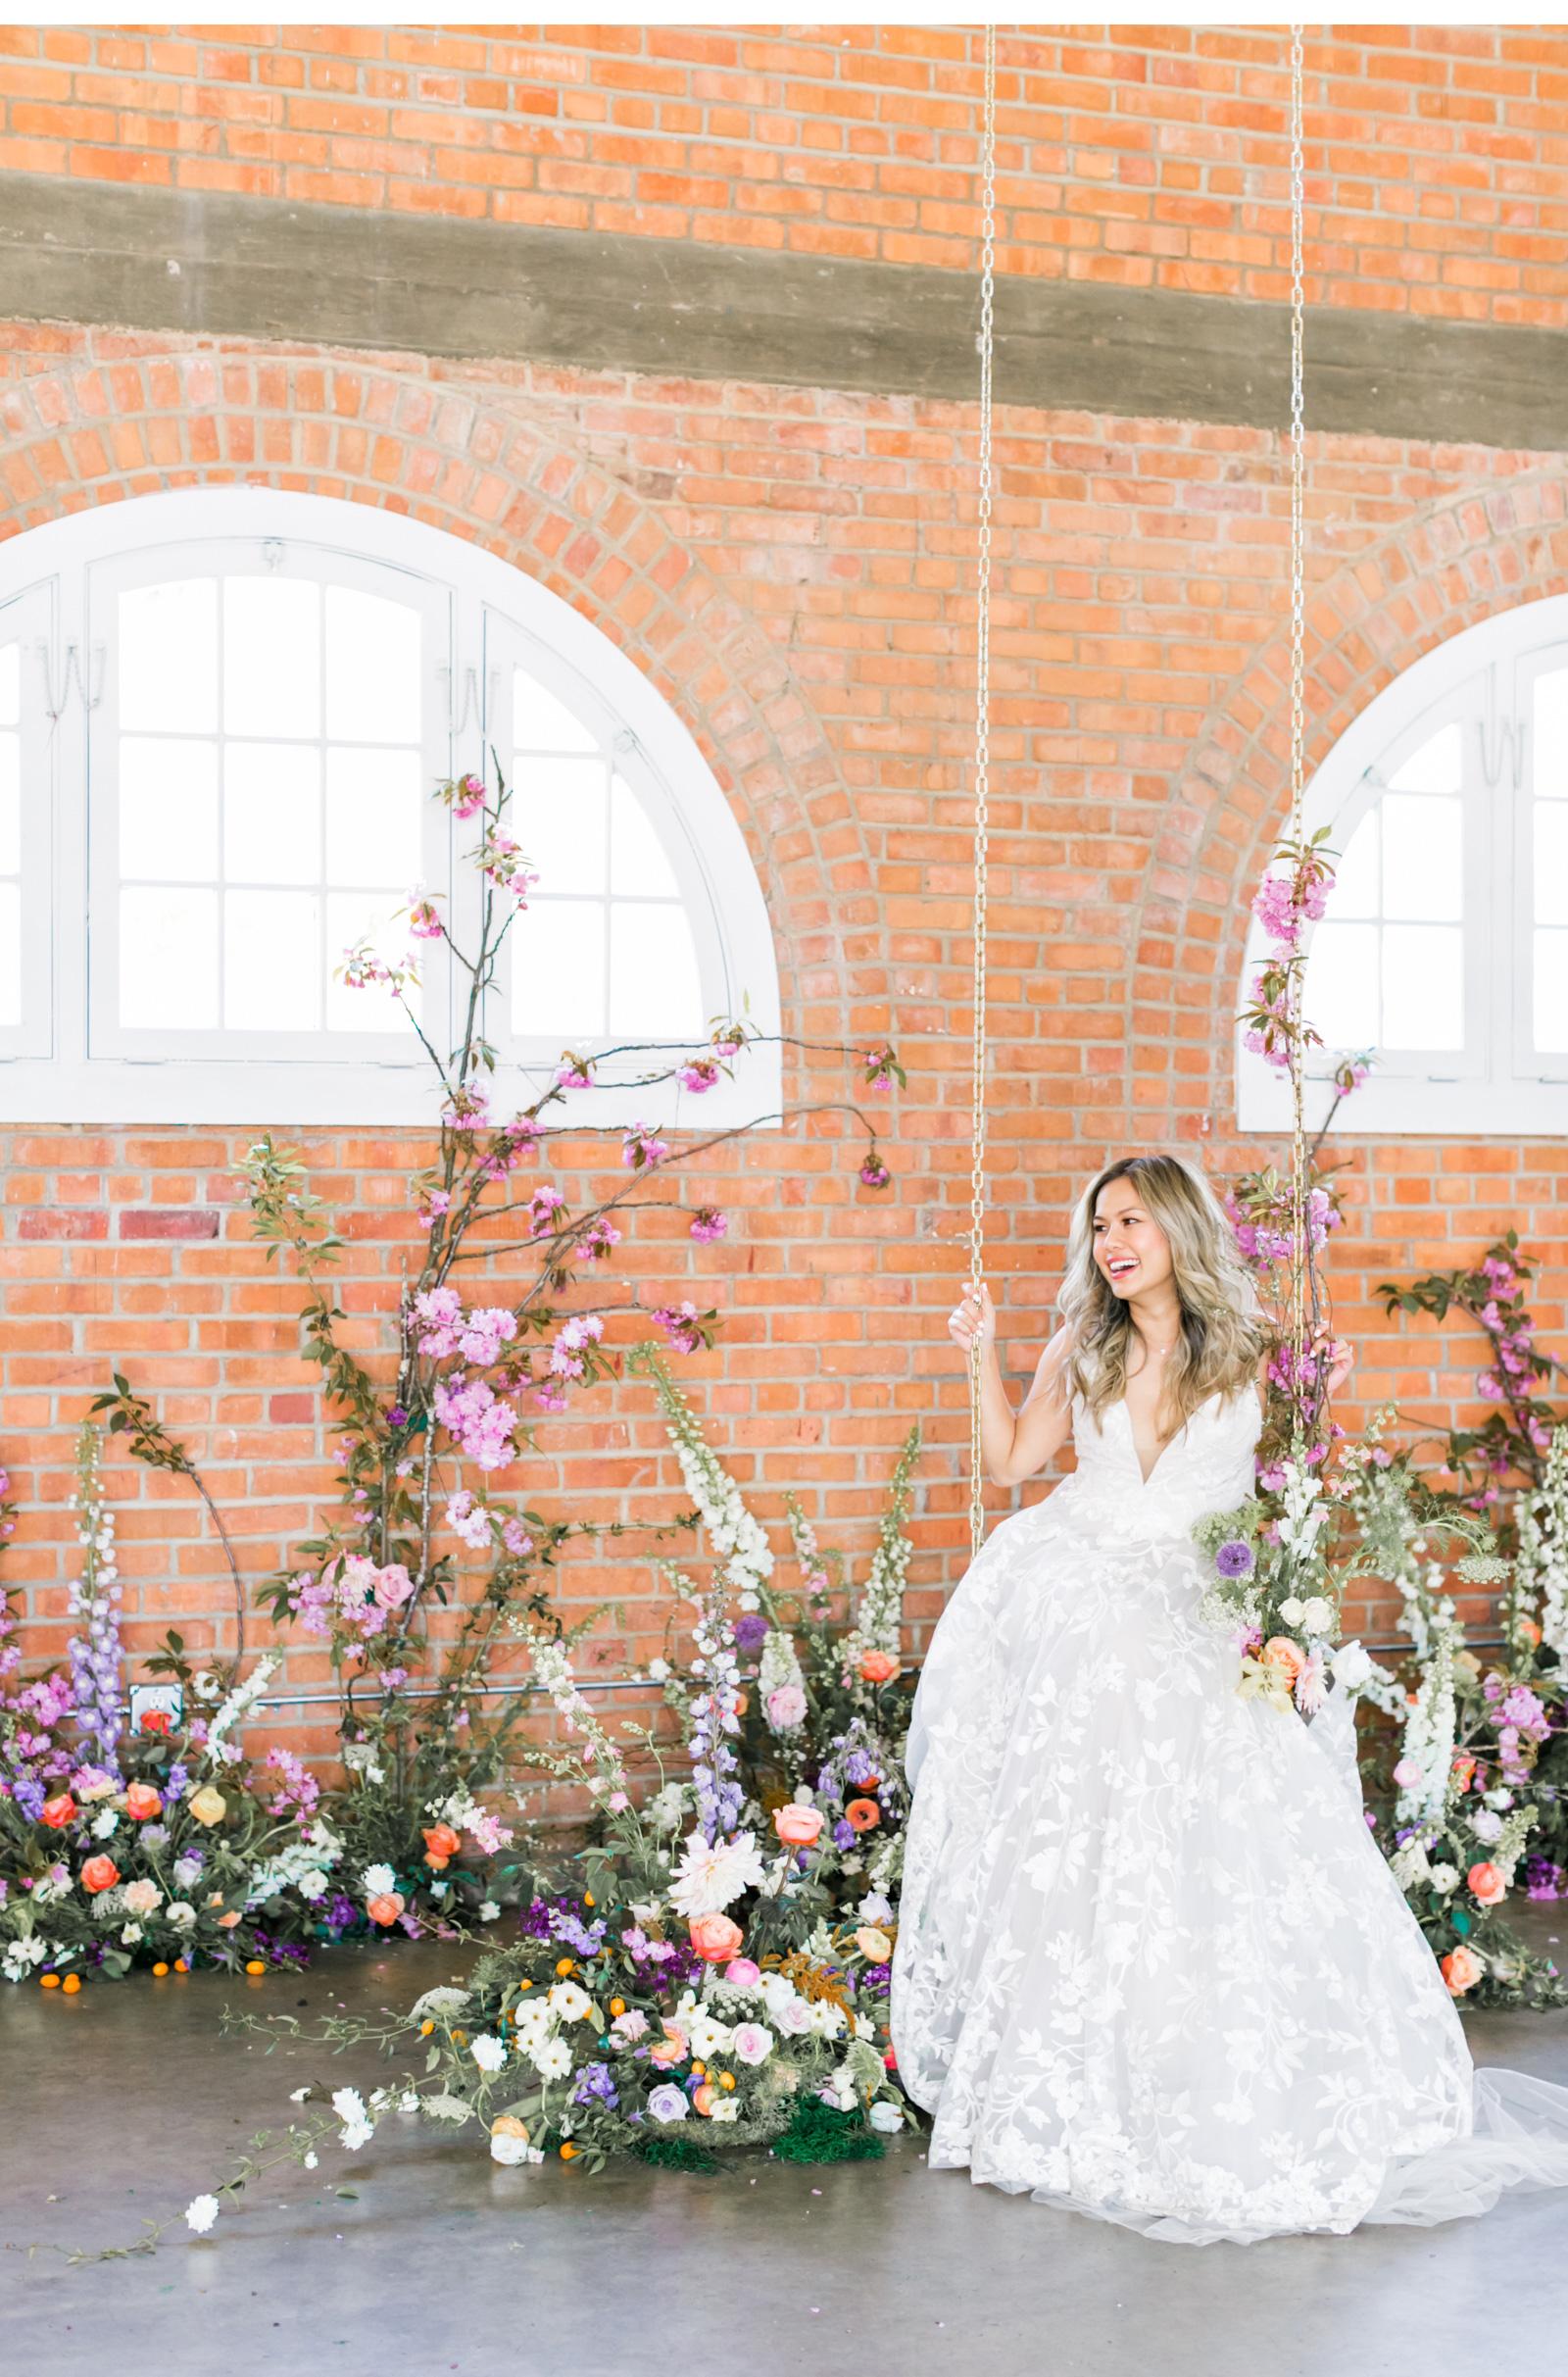 Malibu-Weddings-Natalie-Schutt-Photography-Inspired-by-This_05.jpg